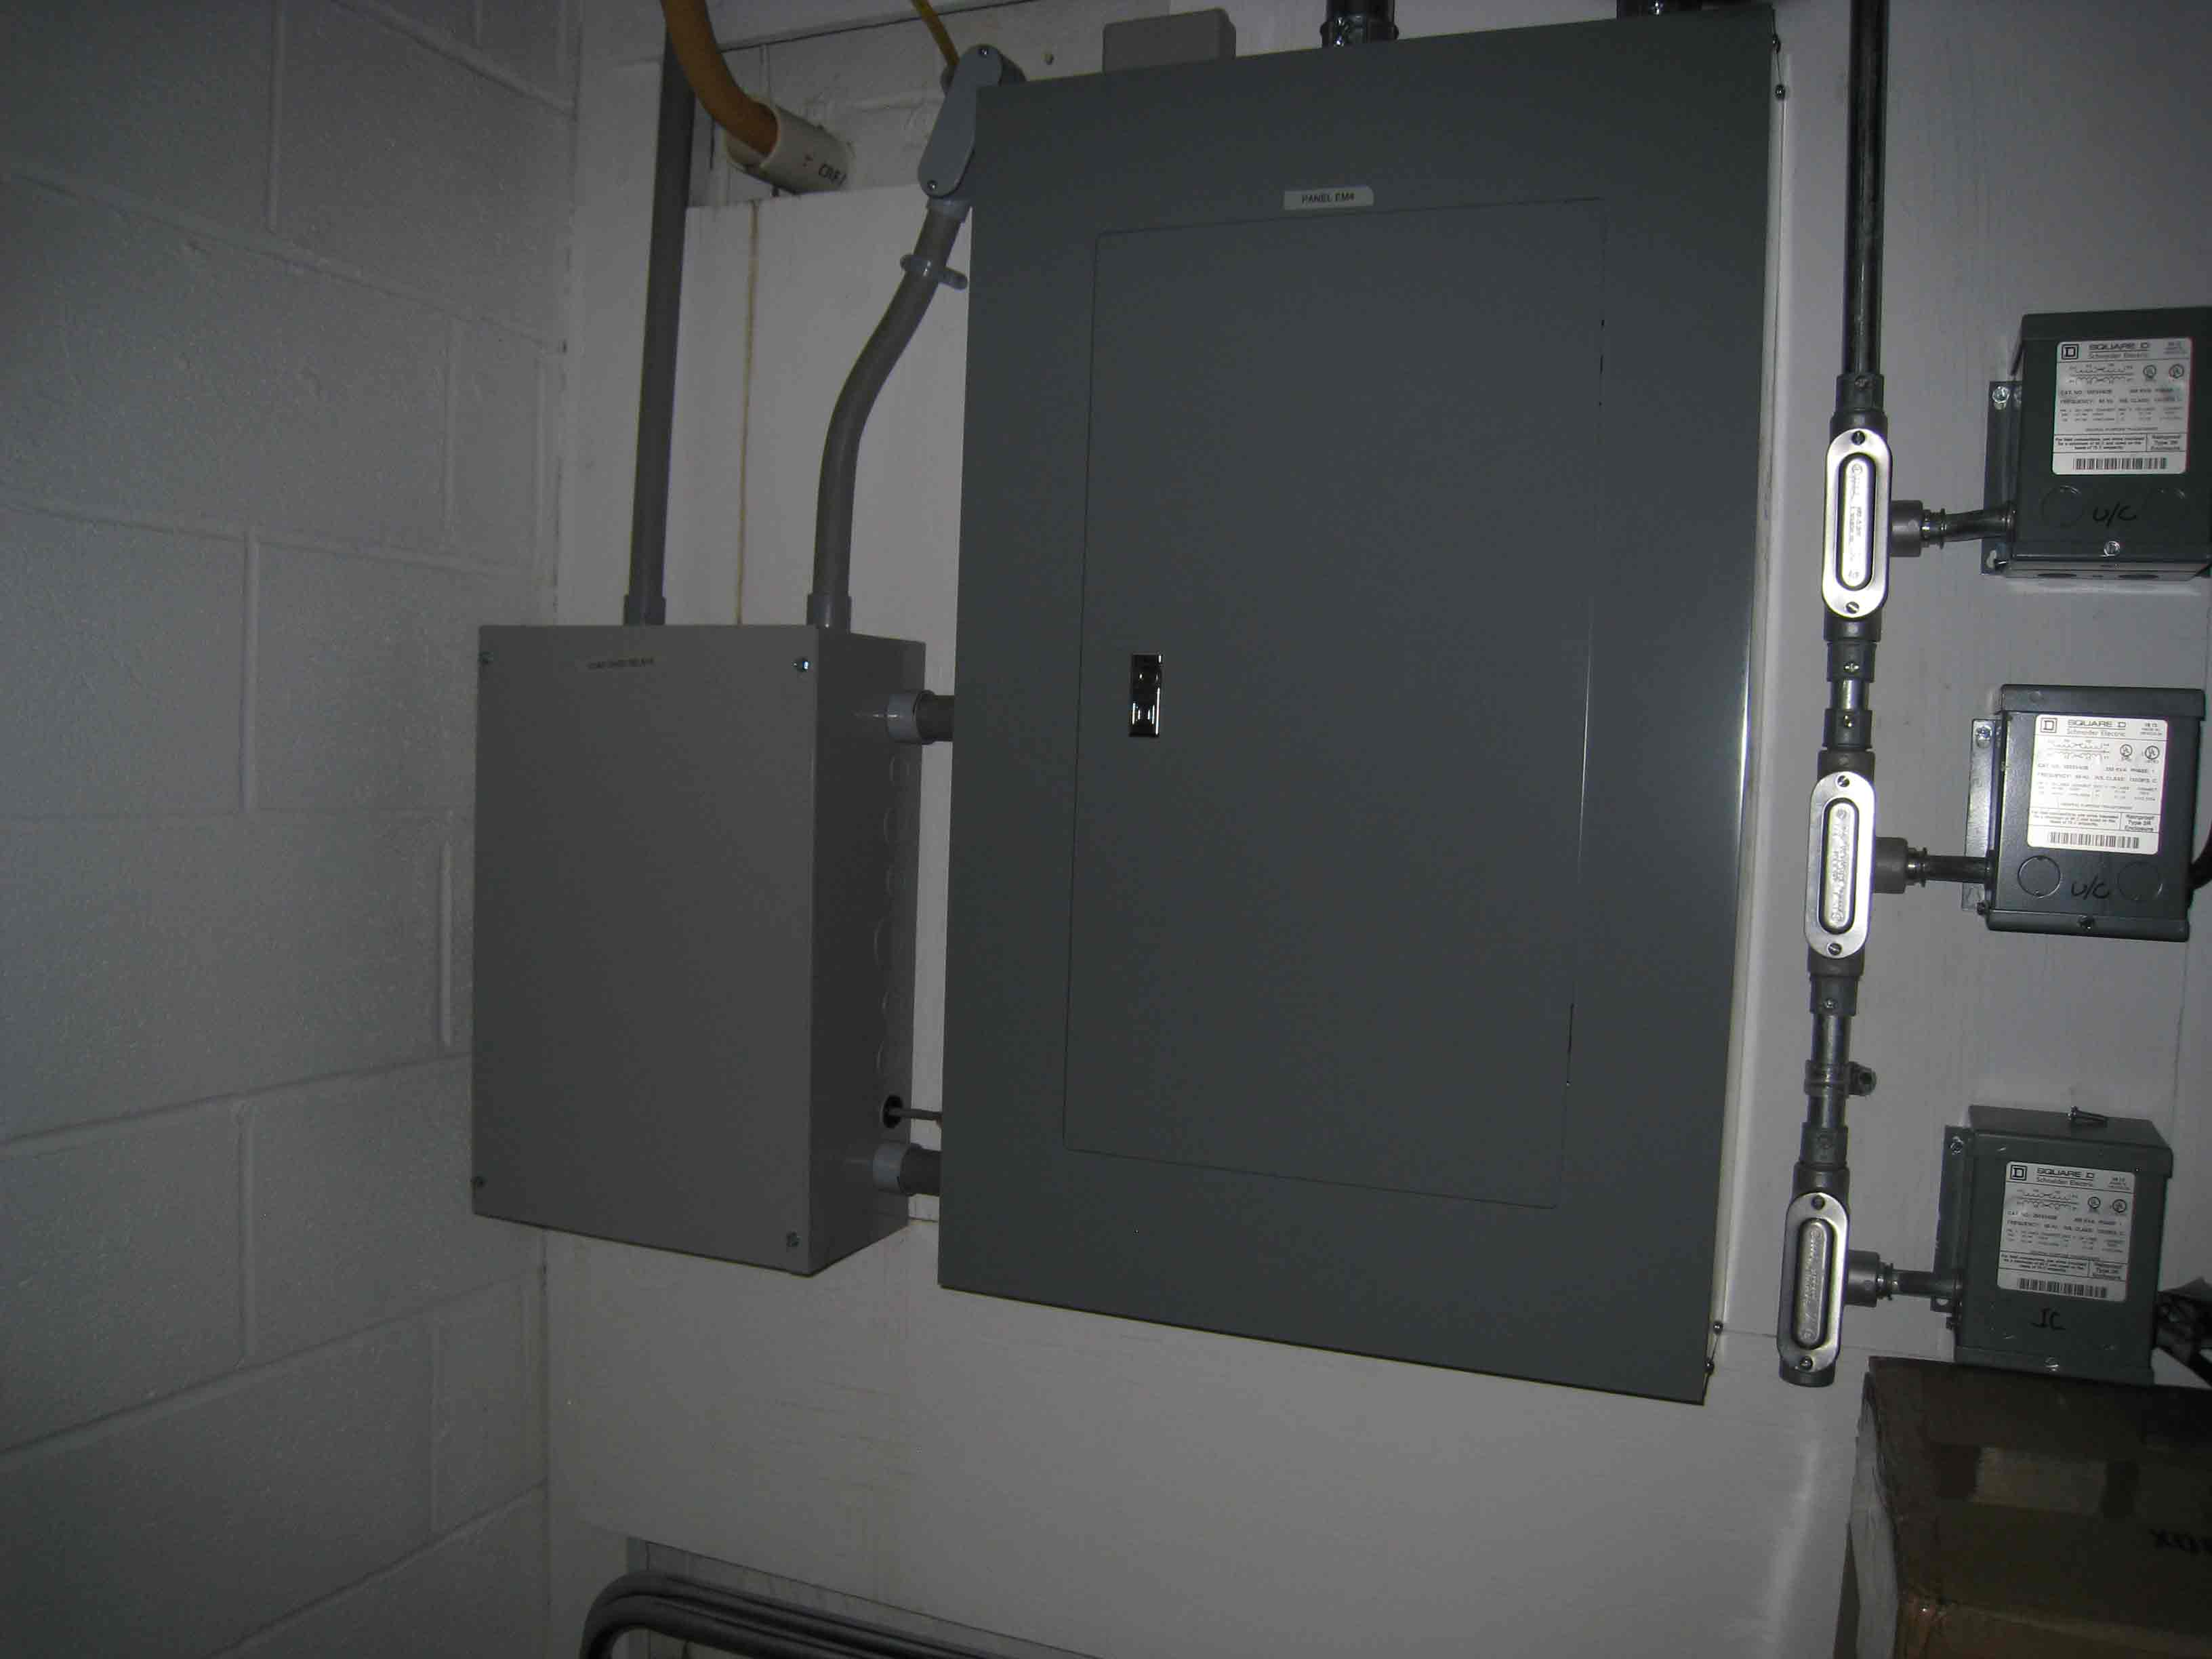 125kw Baldor Advanced Control Systems